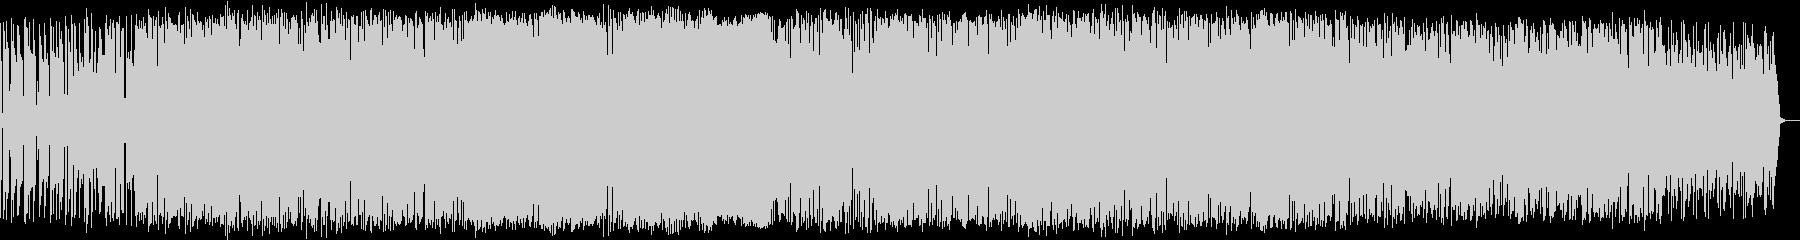 Identifiedの未再生の波形